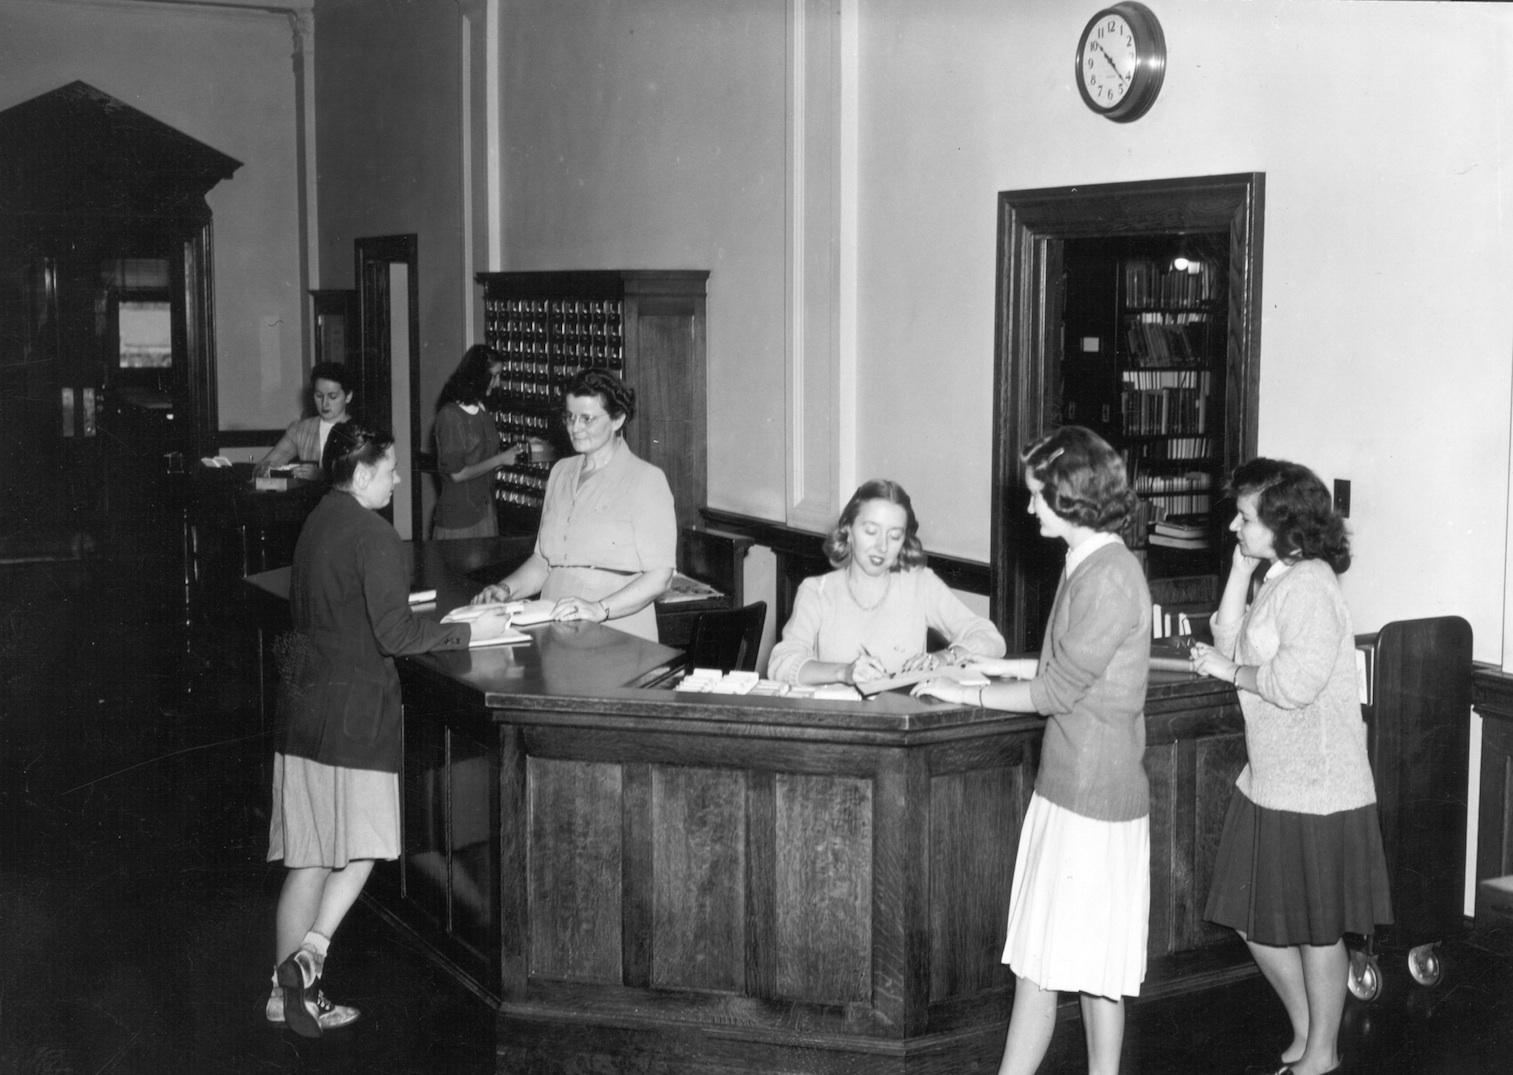 Circulation Desk in 1945